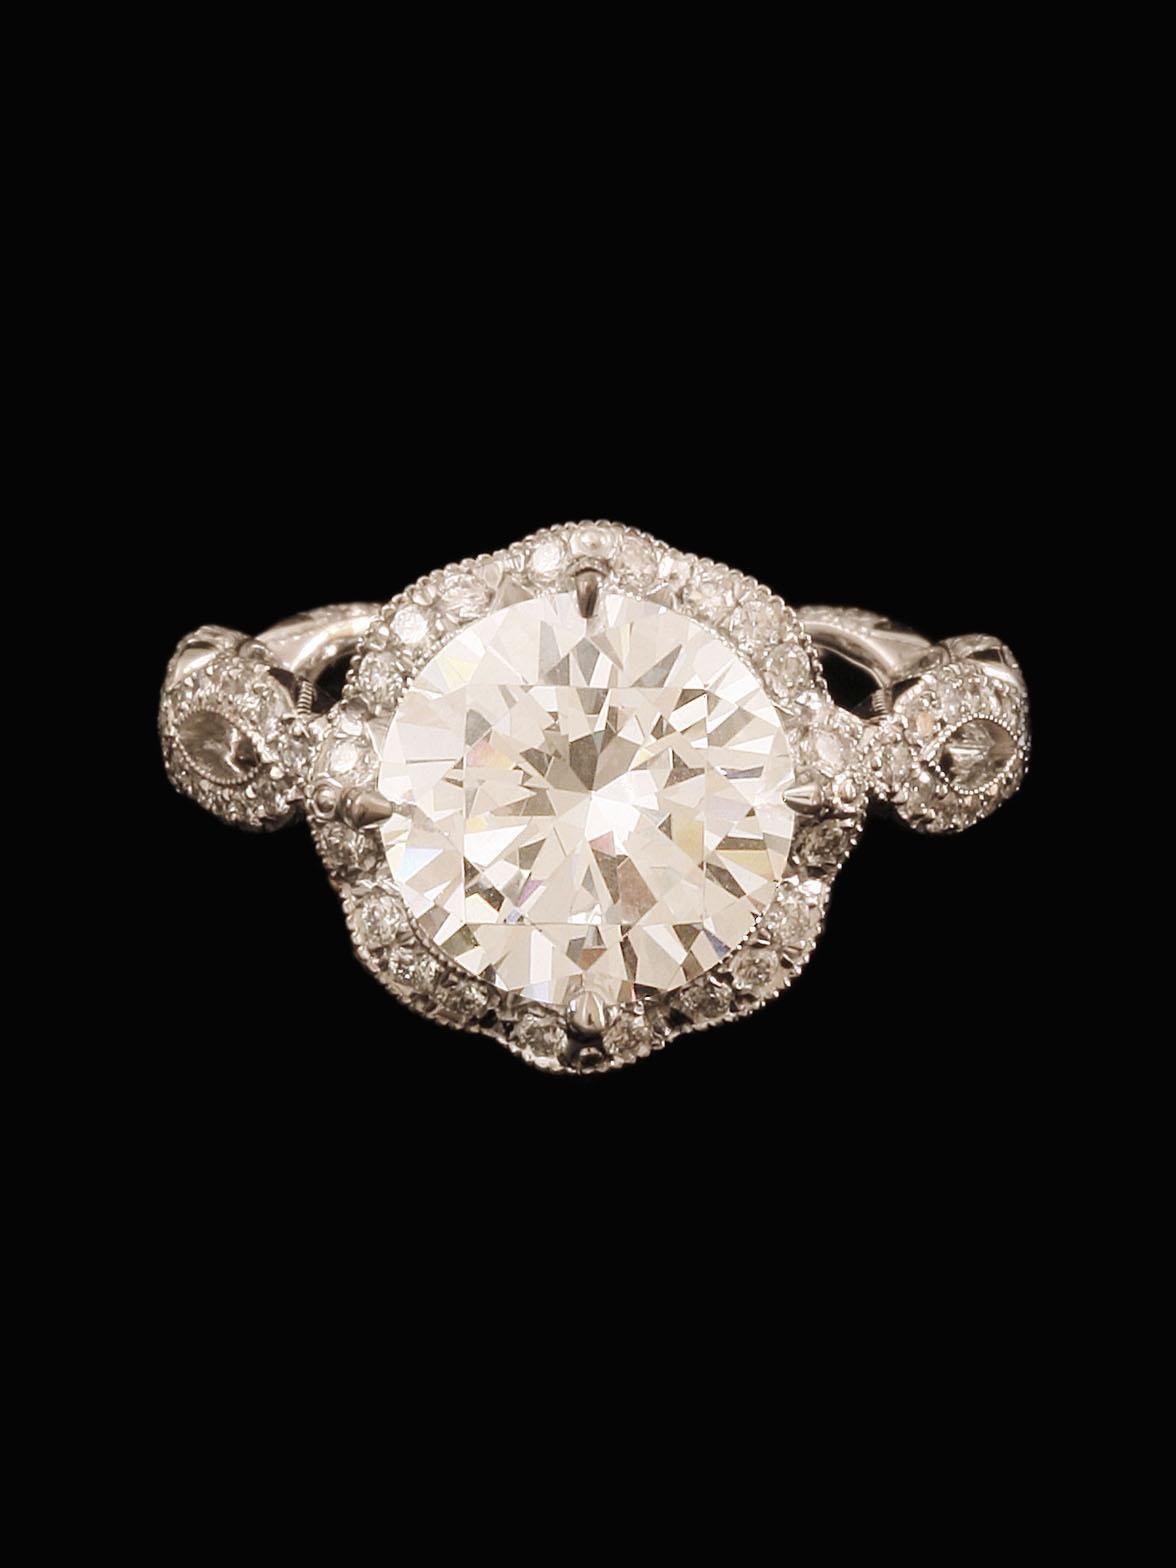 Katharine James Bellas Love Collection Diamond Engagement Ring